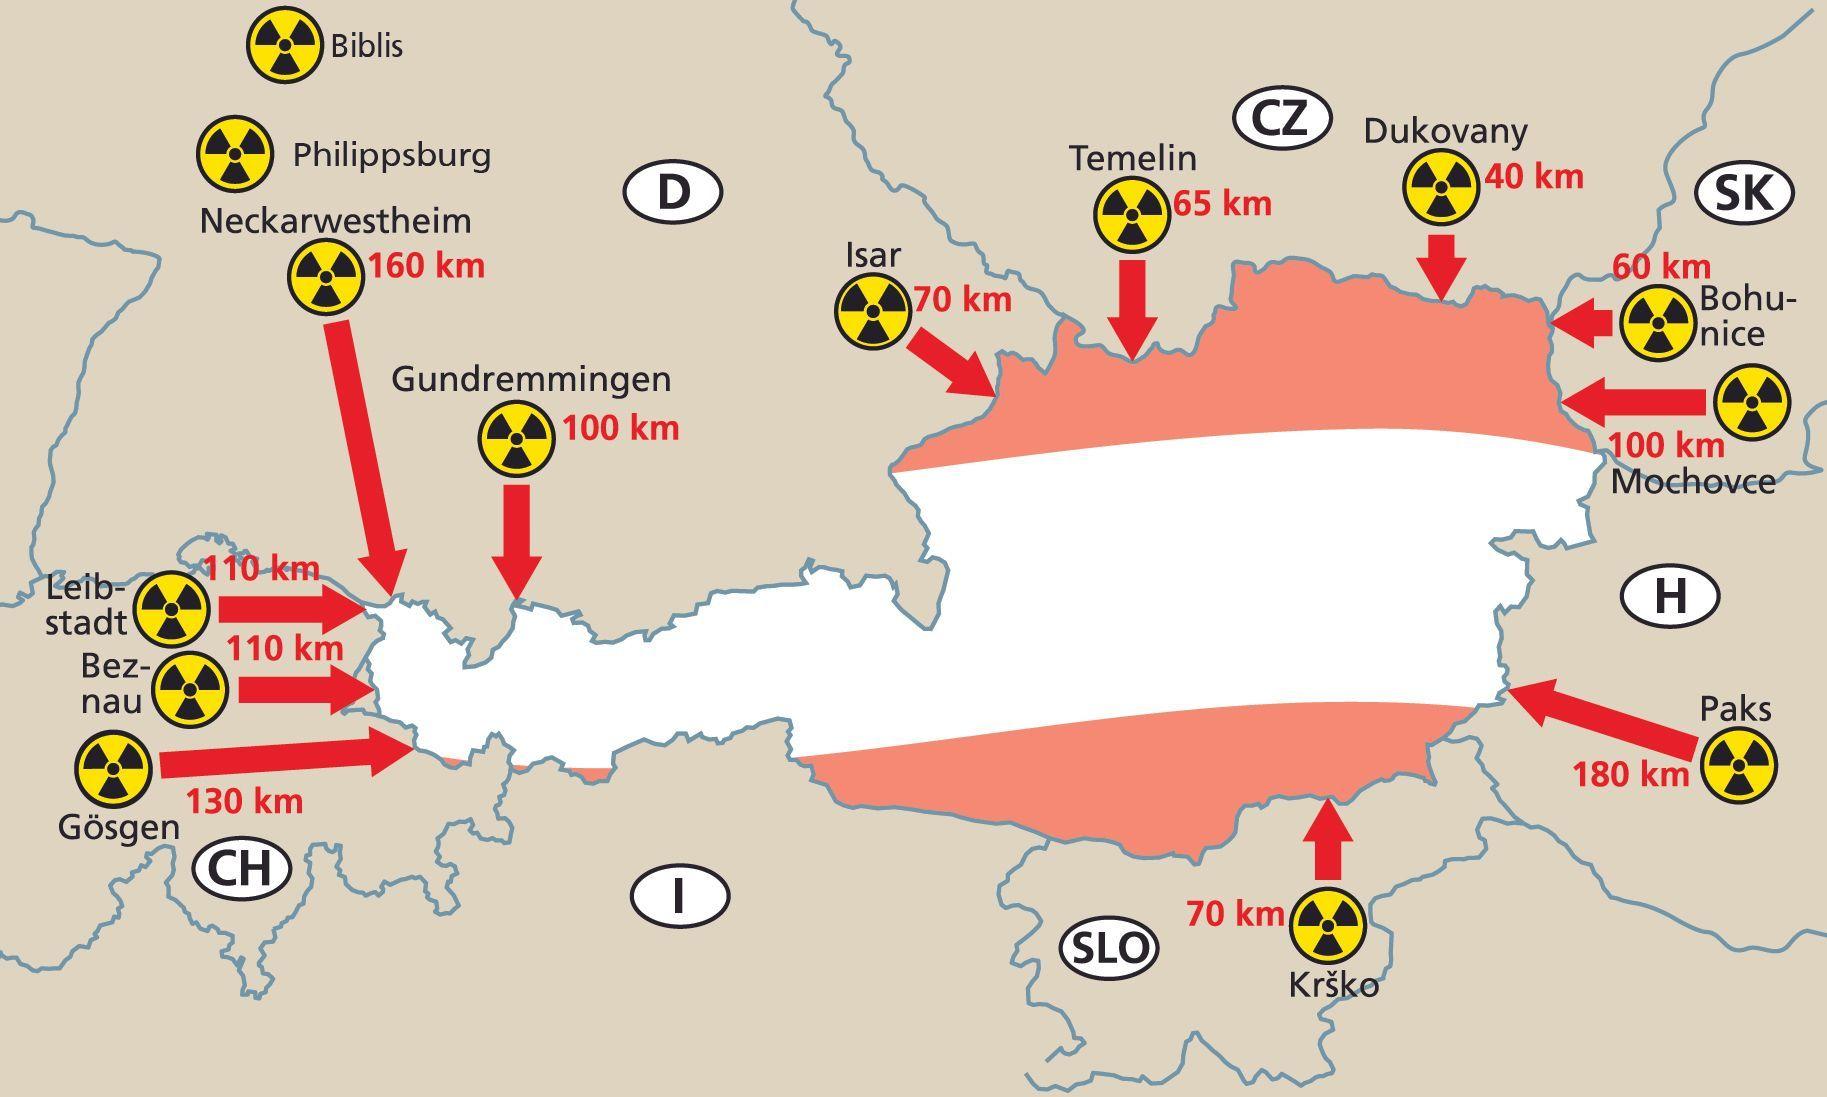 Bildquelle:https://www.google.at/search?q=atomkraftwerke+rund+um+%C3%B6sterreich&tbm=isch&source=iu&ictx=1&fir=GprykbGFG0VDyM%253A%252Cb9J5GQQub_98GM%252C_&usg=__Kdlsc7OV-iKC8-AhXEWG0m08s8o%3D&sa=X&ved=0ahUKEwjile3ChqrZAhUPEVAKHV14BxUQ9QEINzAB#imgrc=GprykbGFG0VDyM:  am 16.02.2018.